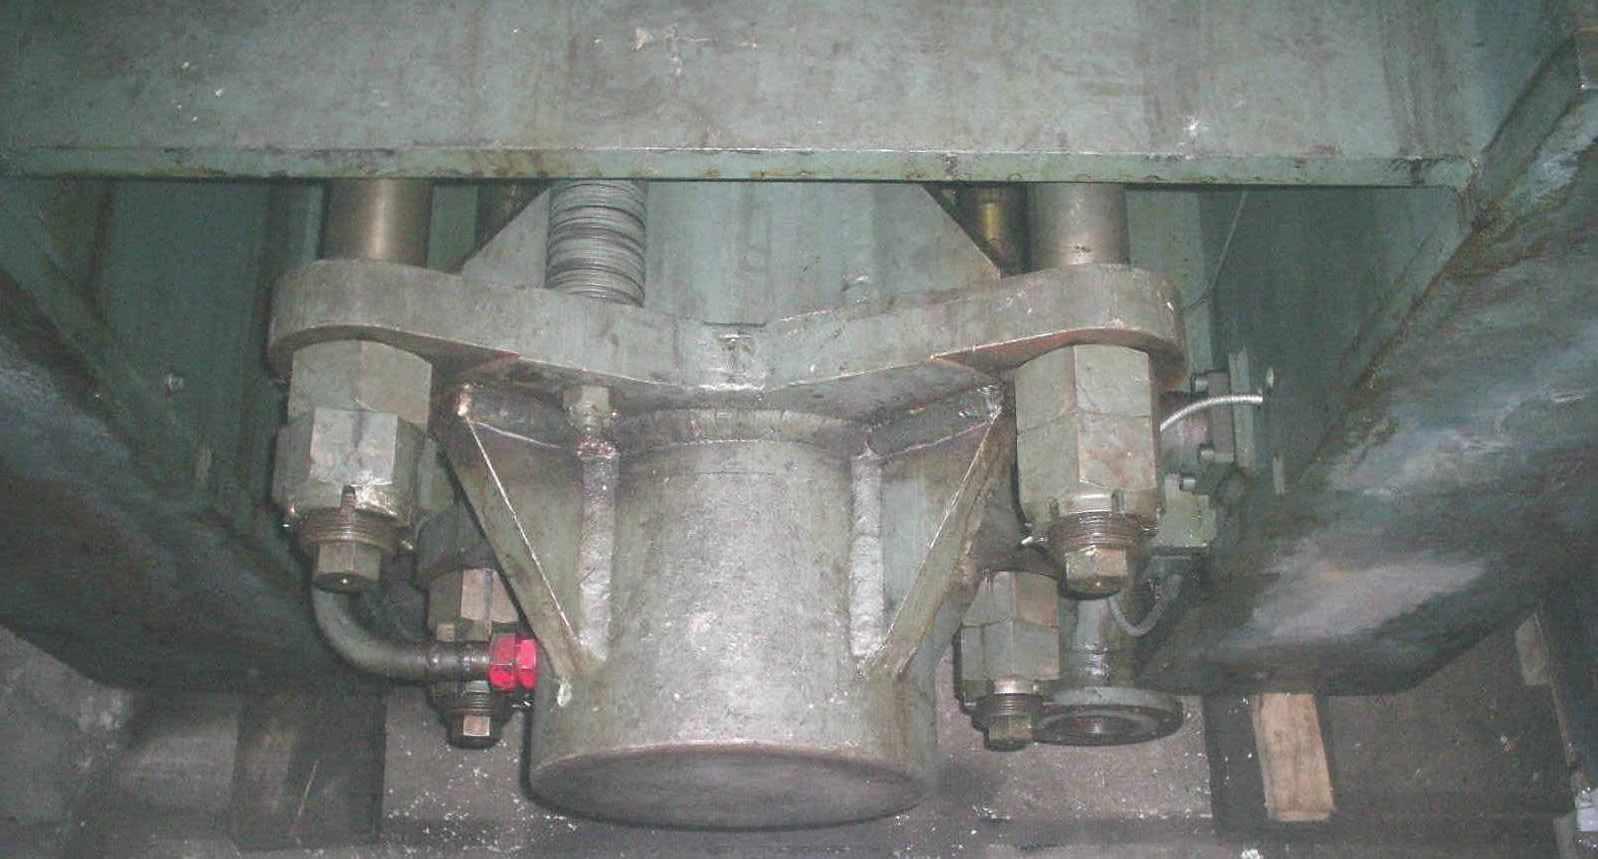 coussin_serre_flanc_presse_hydraulique.JPG